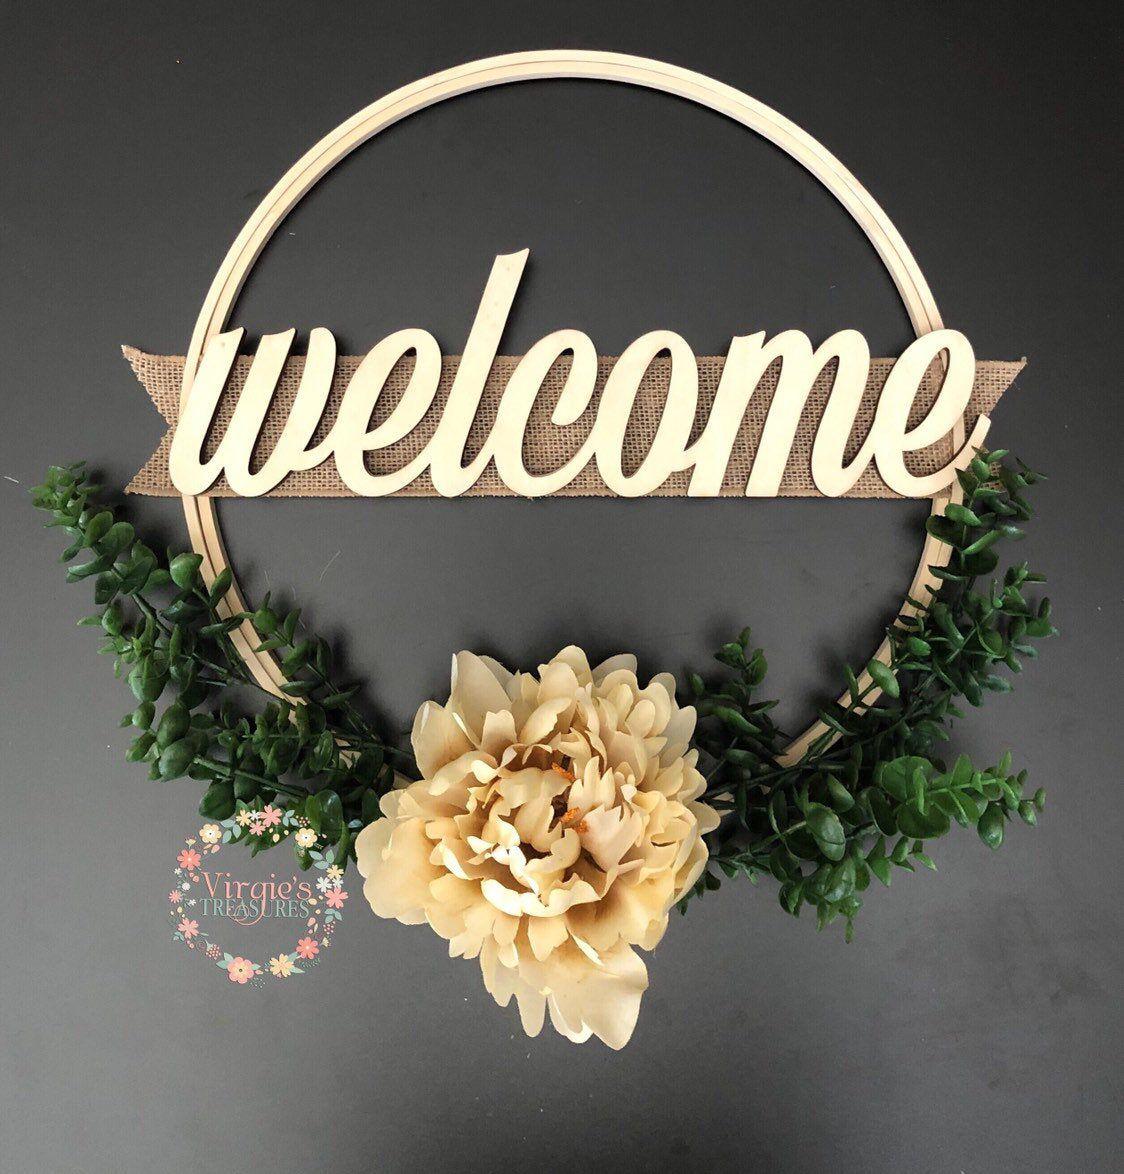 Photo of Embroidery Hoop Wreath, Boxwood & Peony Hoop Wreath, Wall Gallery Wreath, Welcome Wreath, Fall Wreath, Motorhome Wreath, Kitchen Wreath